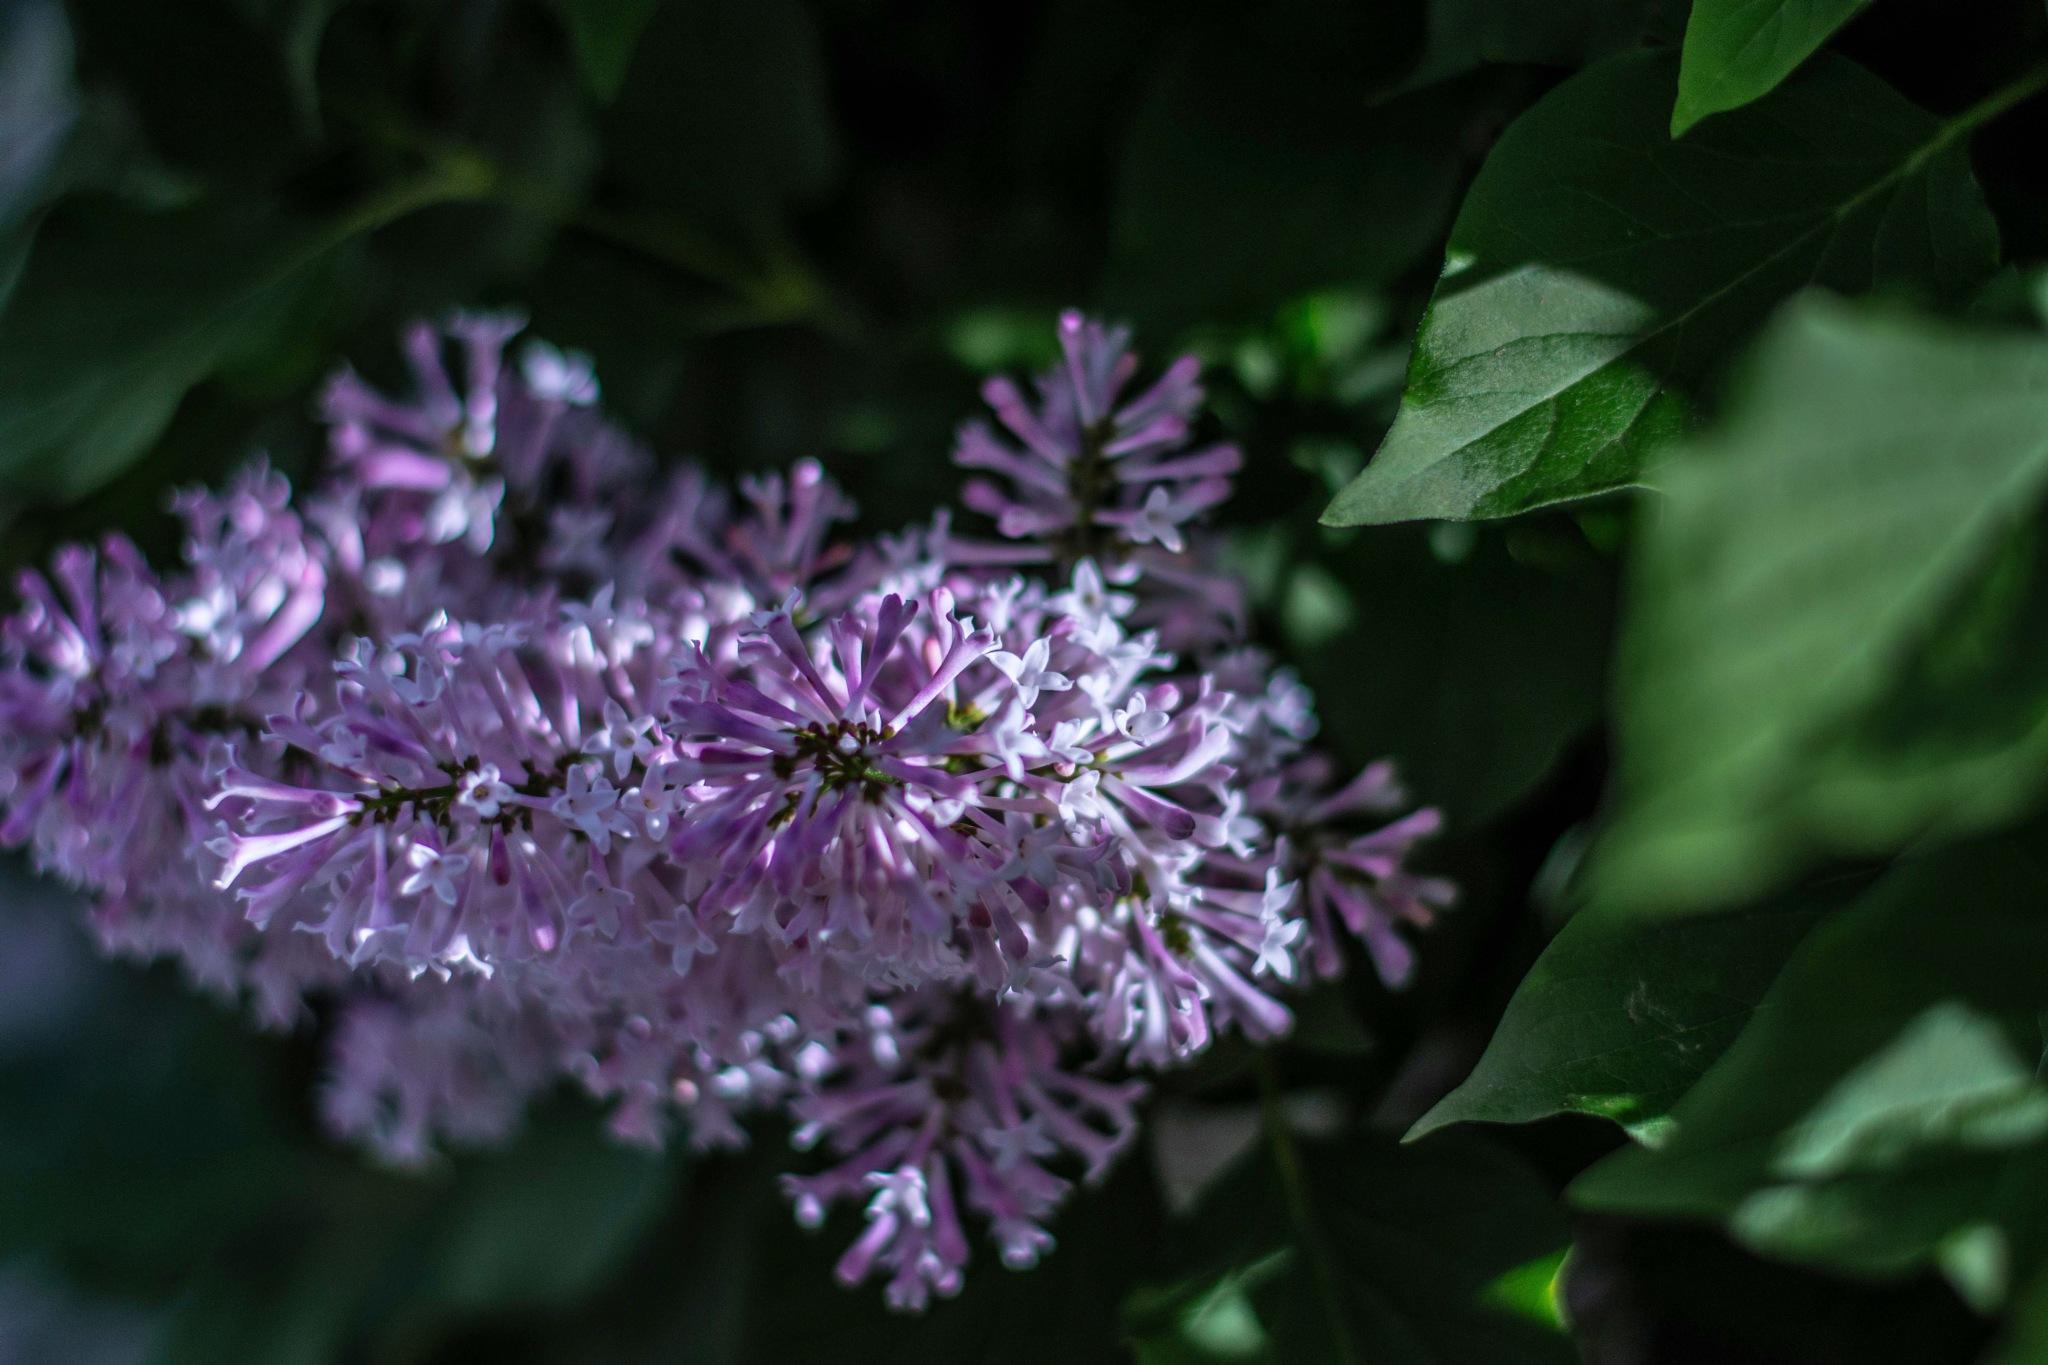 Luscious Low Key Lilac by Randsio Photography